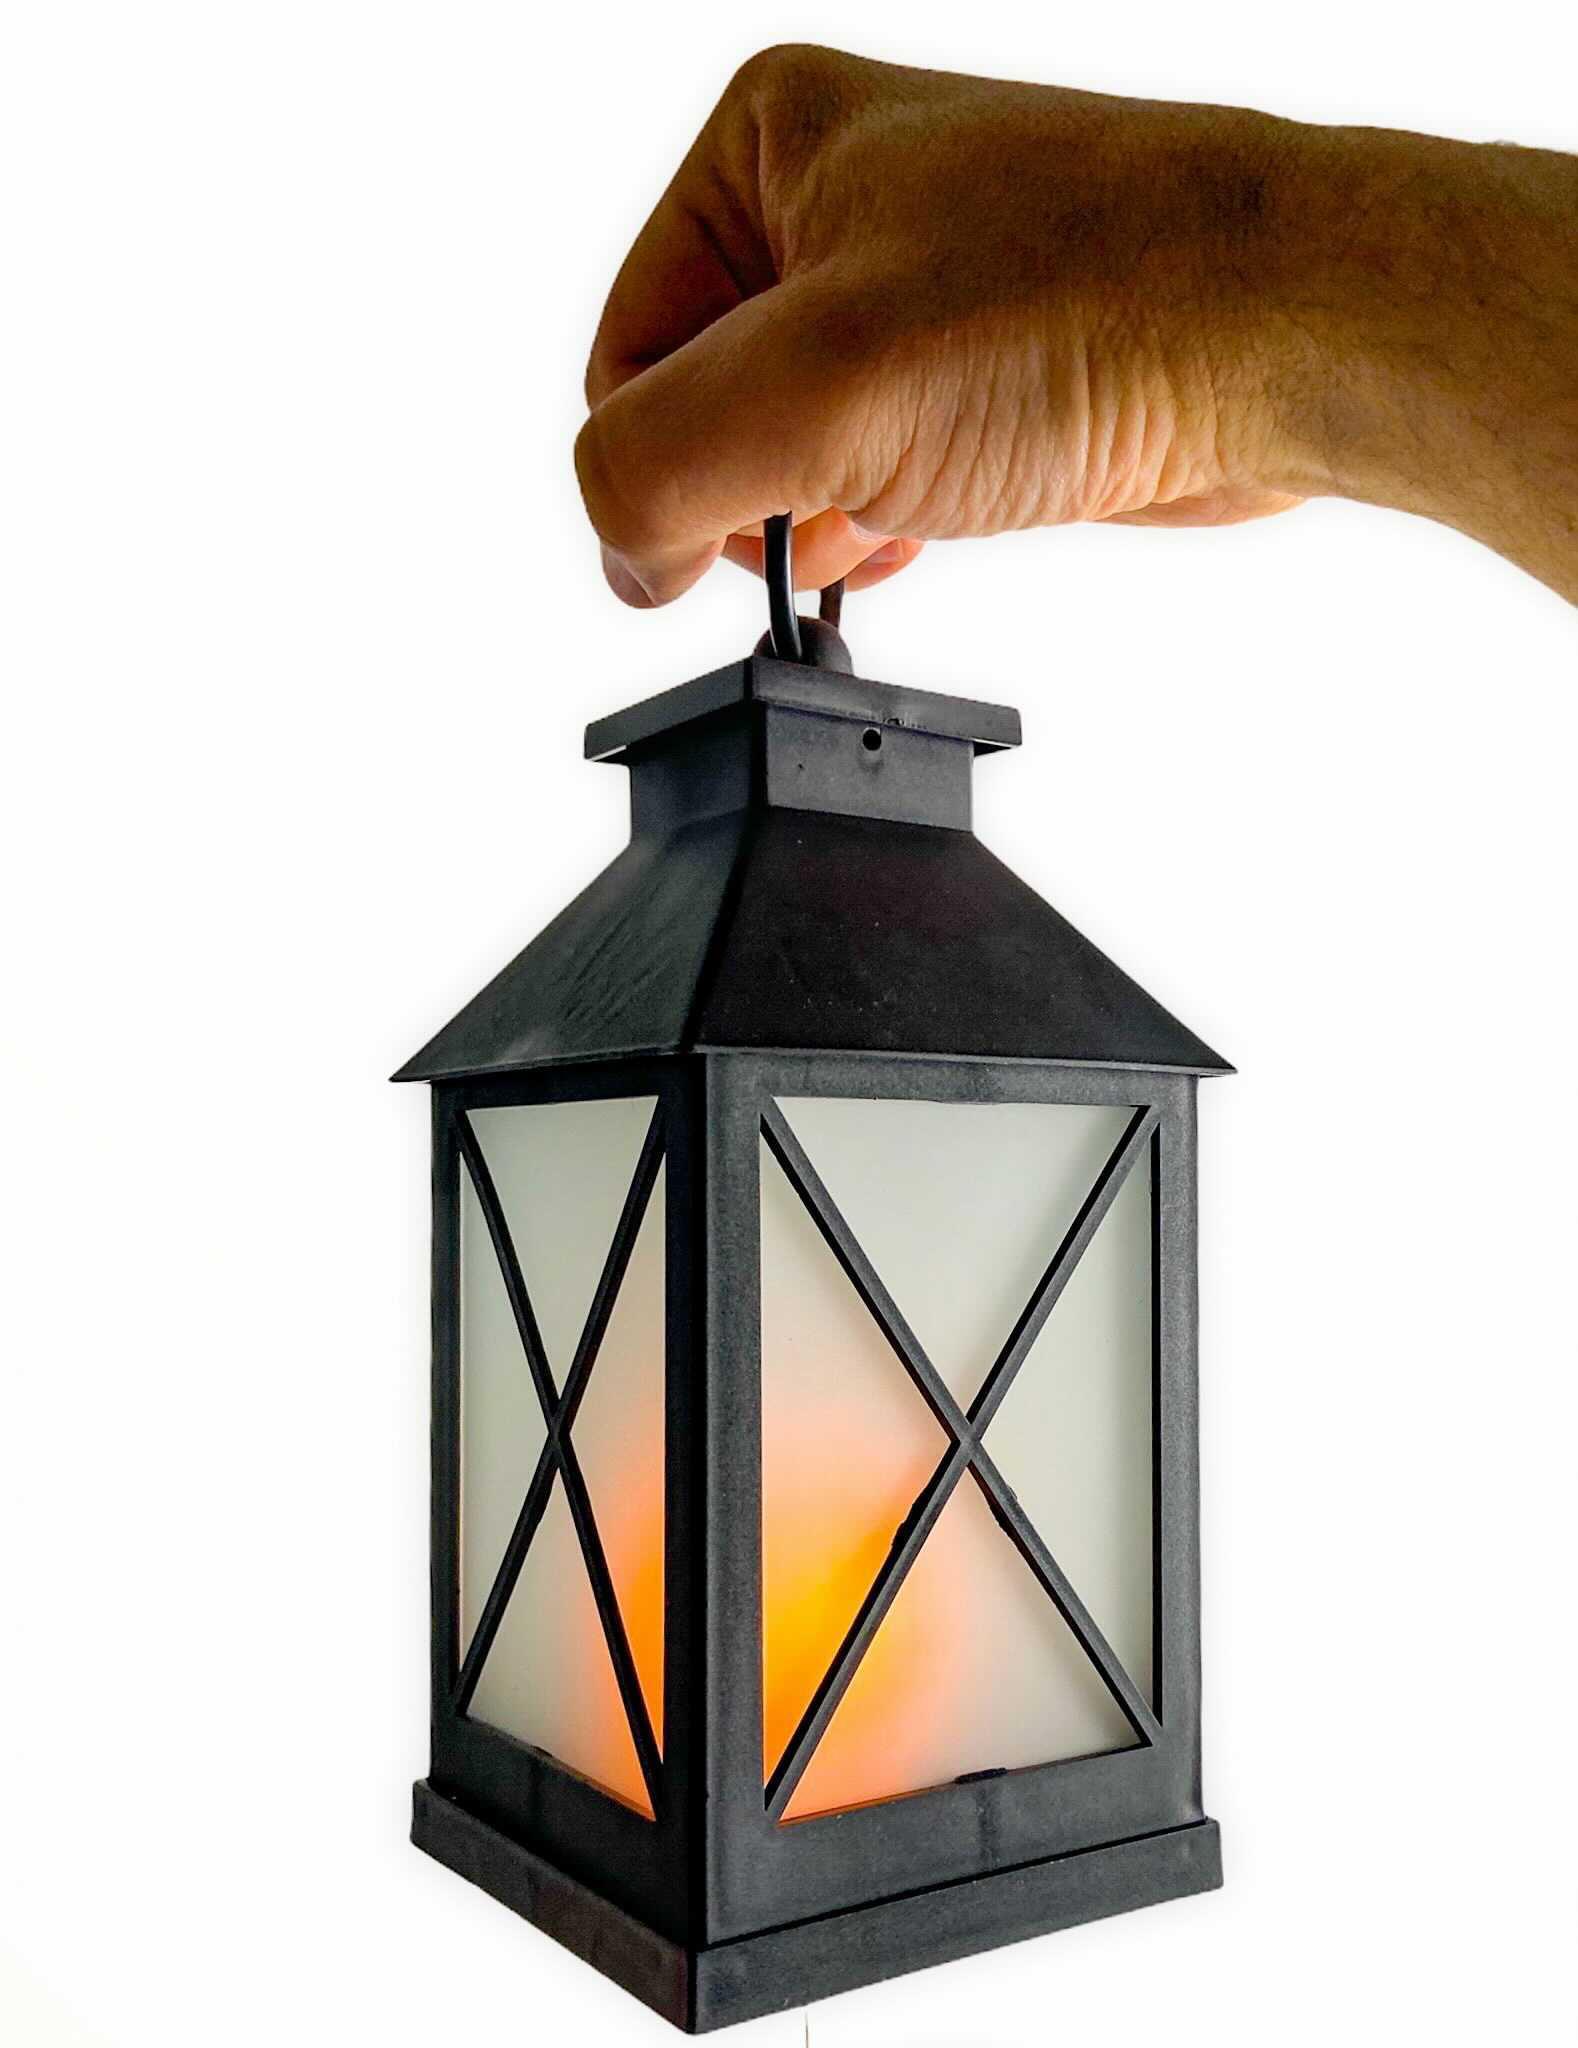 Flicker Flame LED Lantern $12.